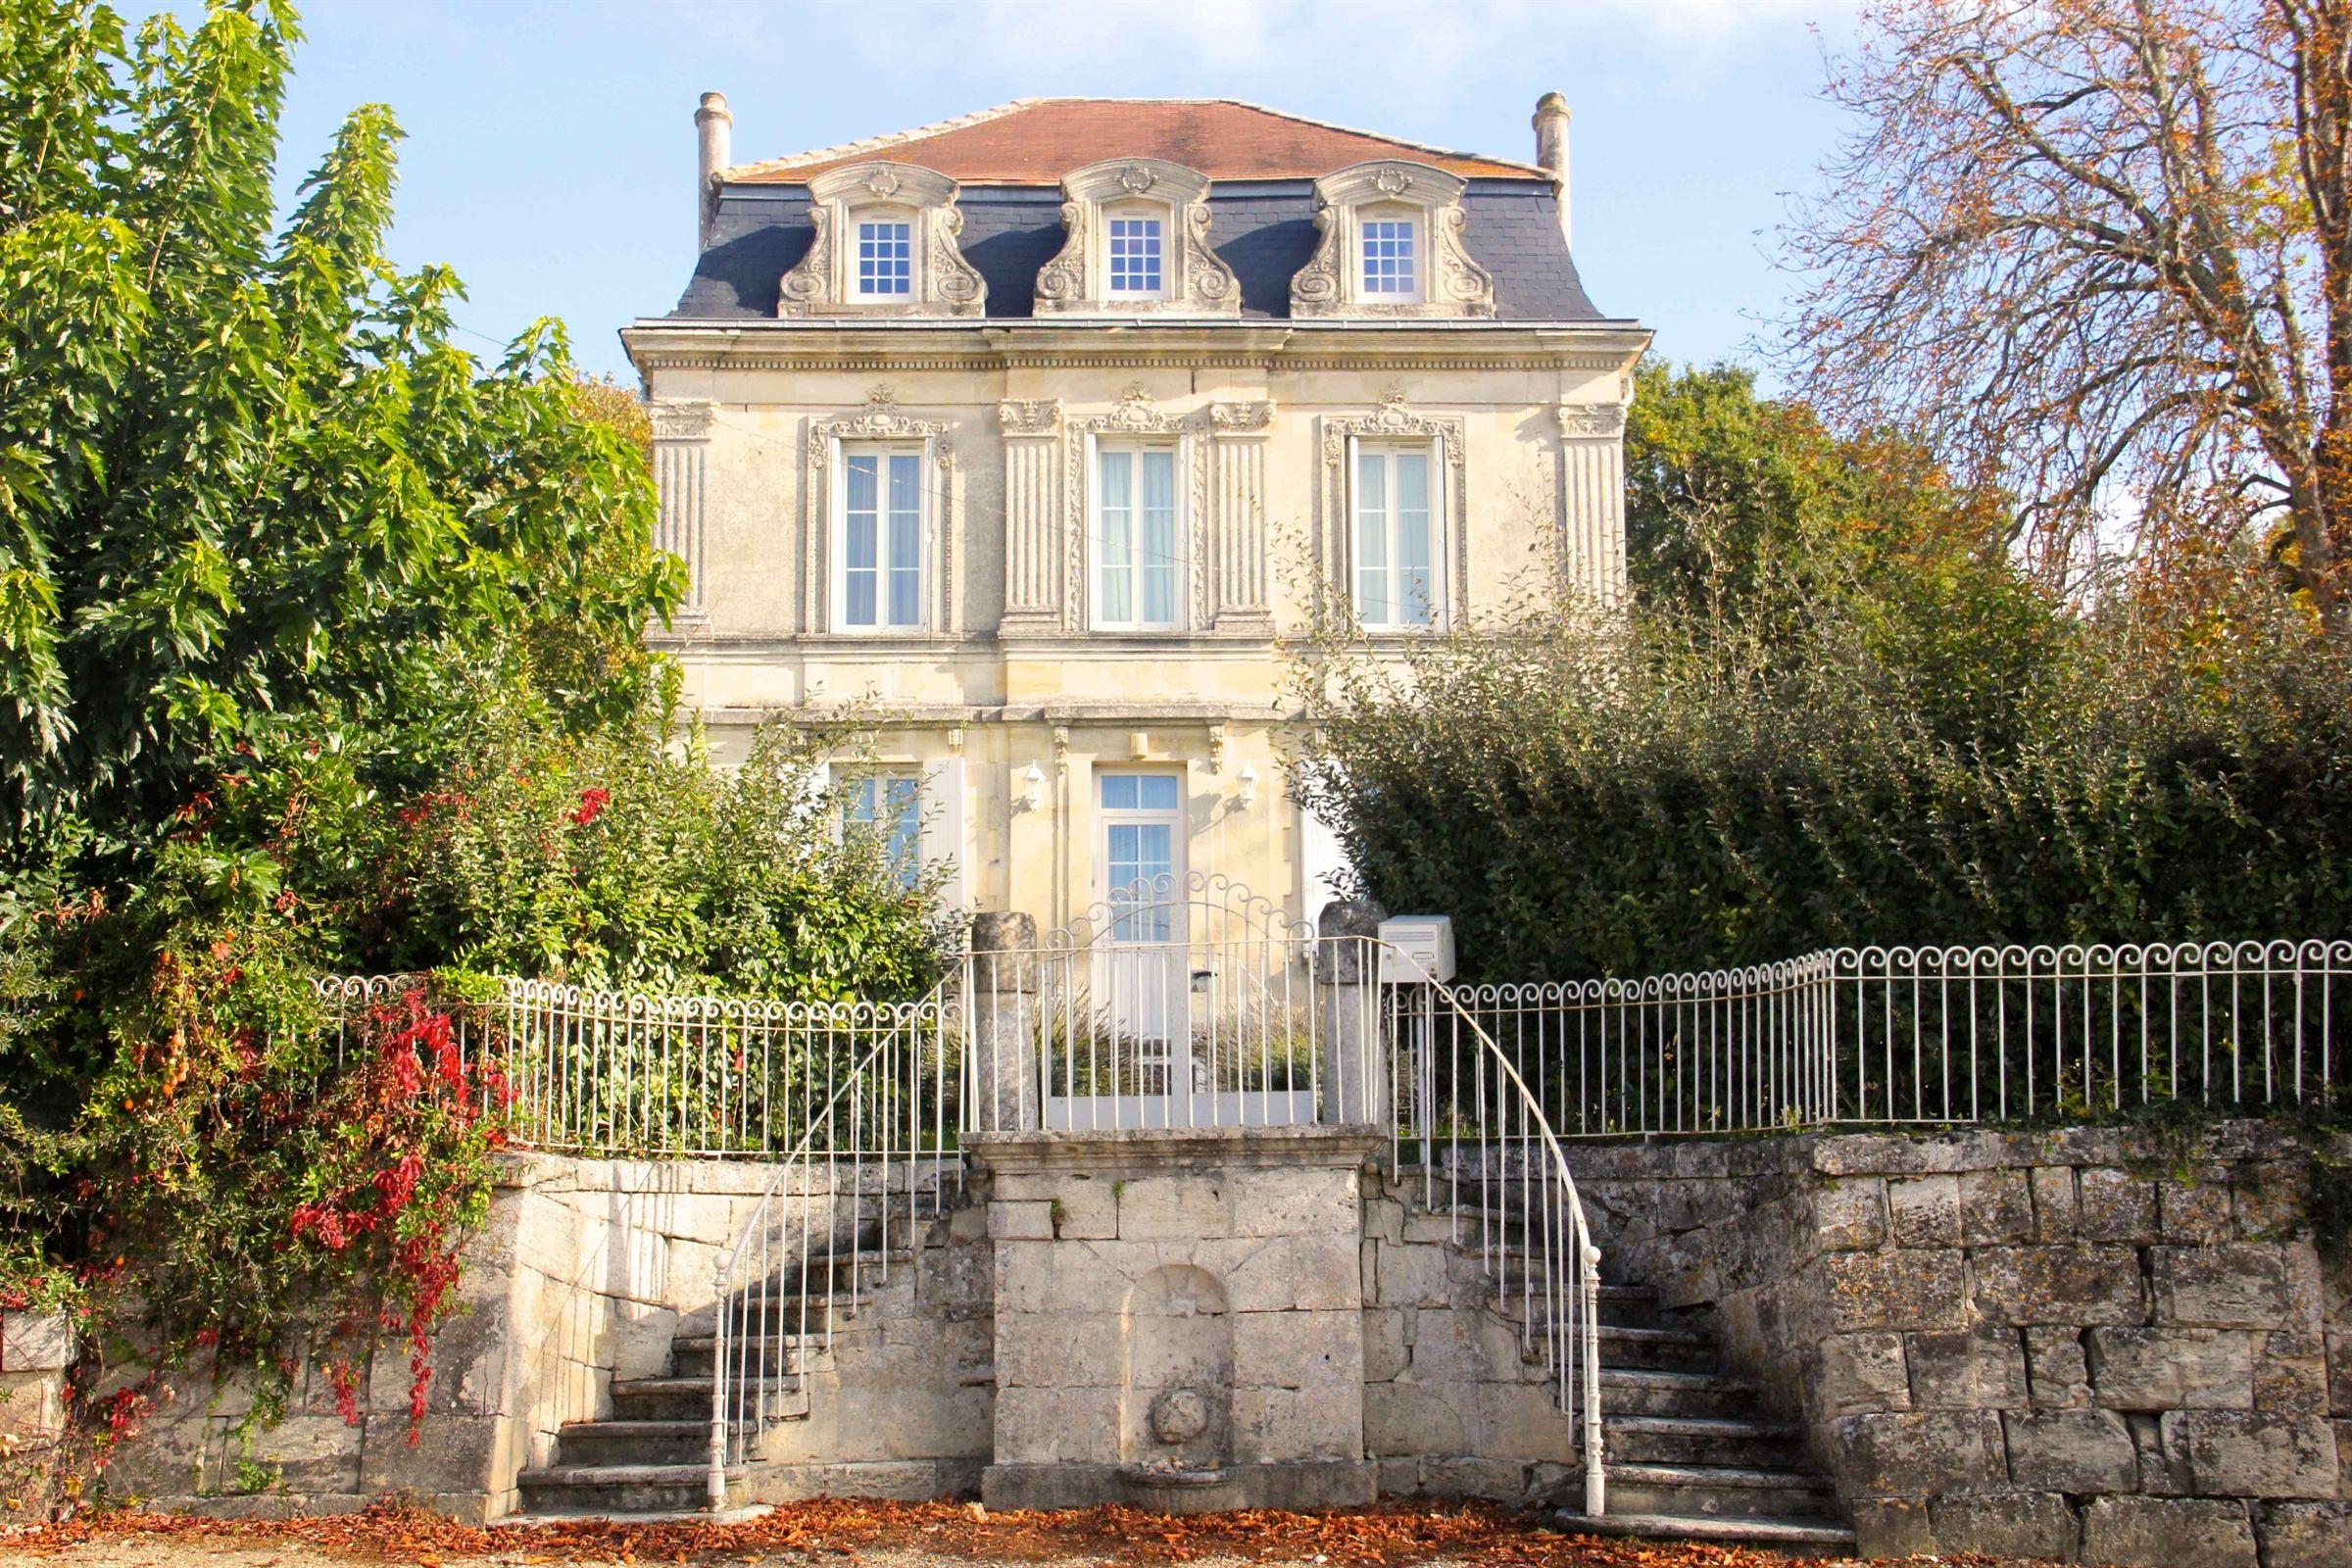 Single Family Home for Sale at BORDEAUX - FRONSAC - ELEGANT HISTORIC MASTER HOUSE Bordeaux, Aquitaine, 33000 France